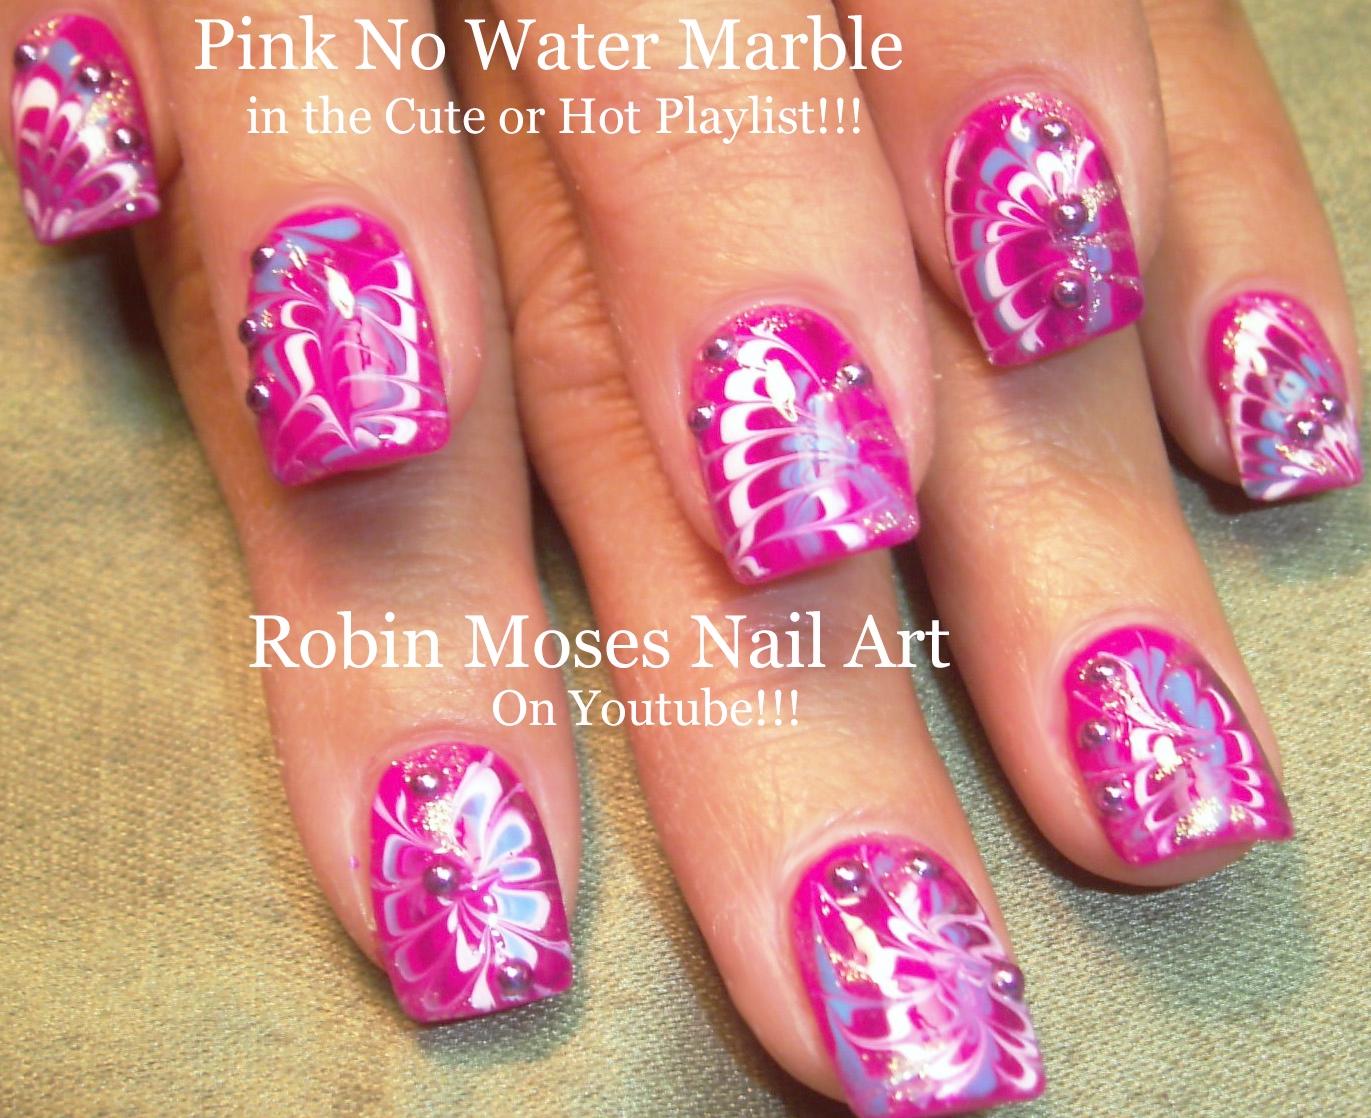 Robin moses nail art no water marble nail art design tutorial monday february 29 2016 prinsesfo Gallery